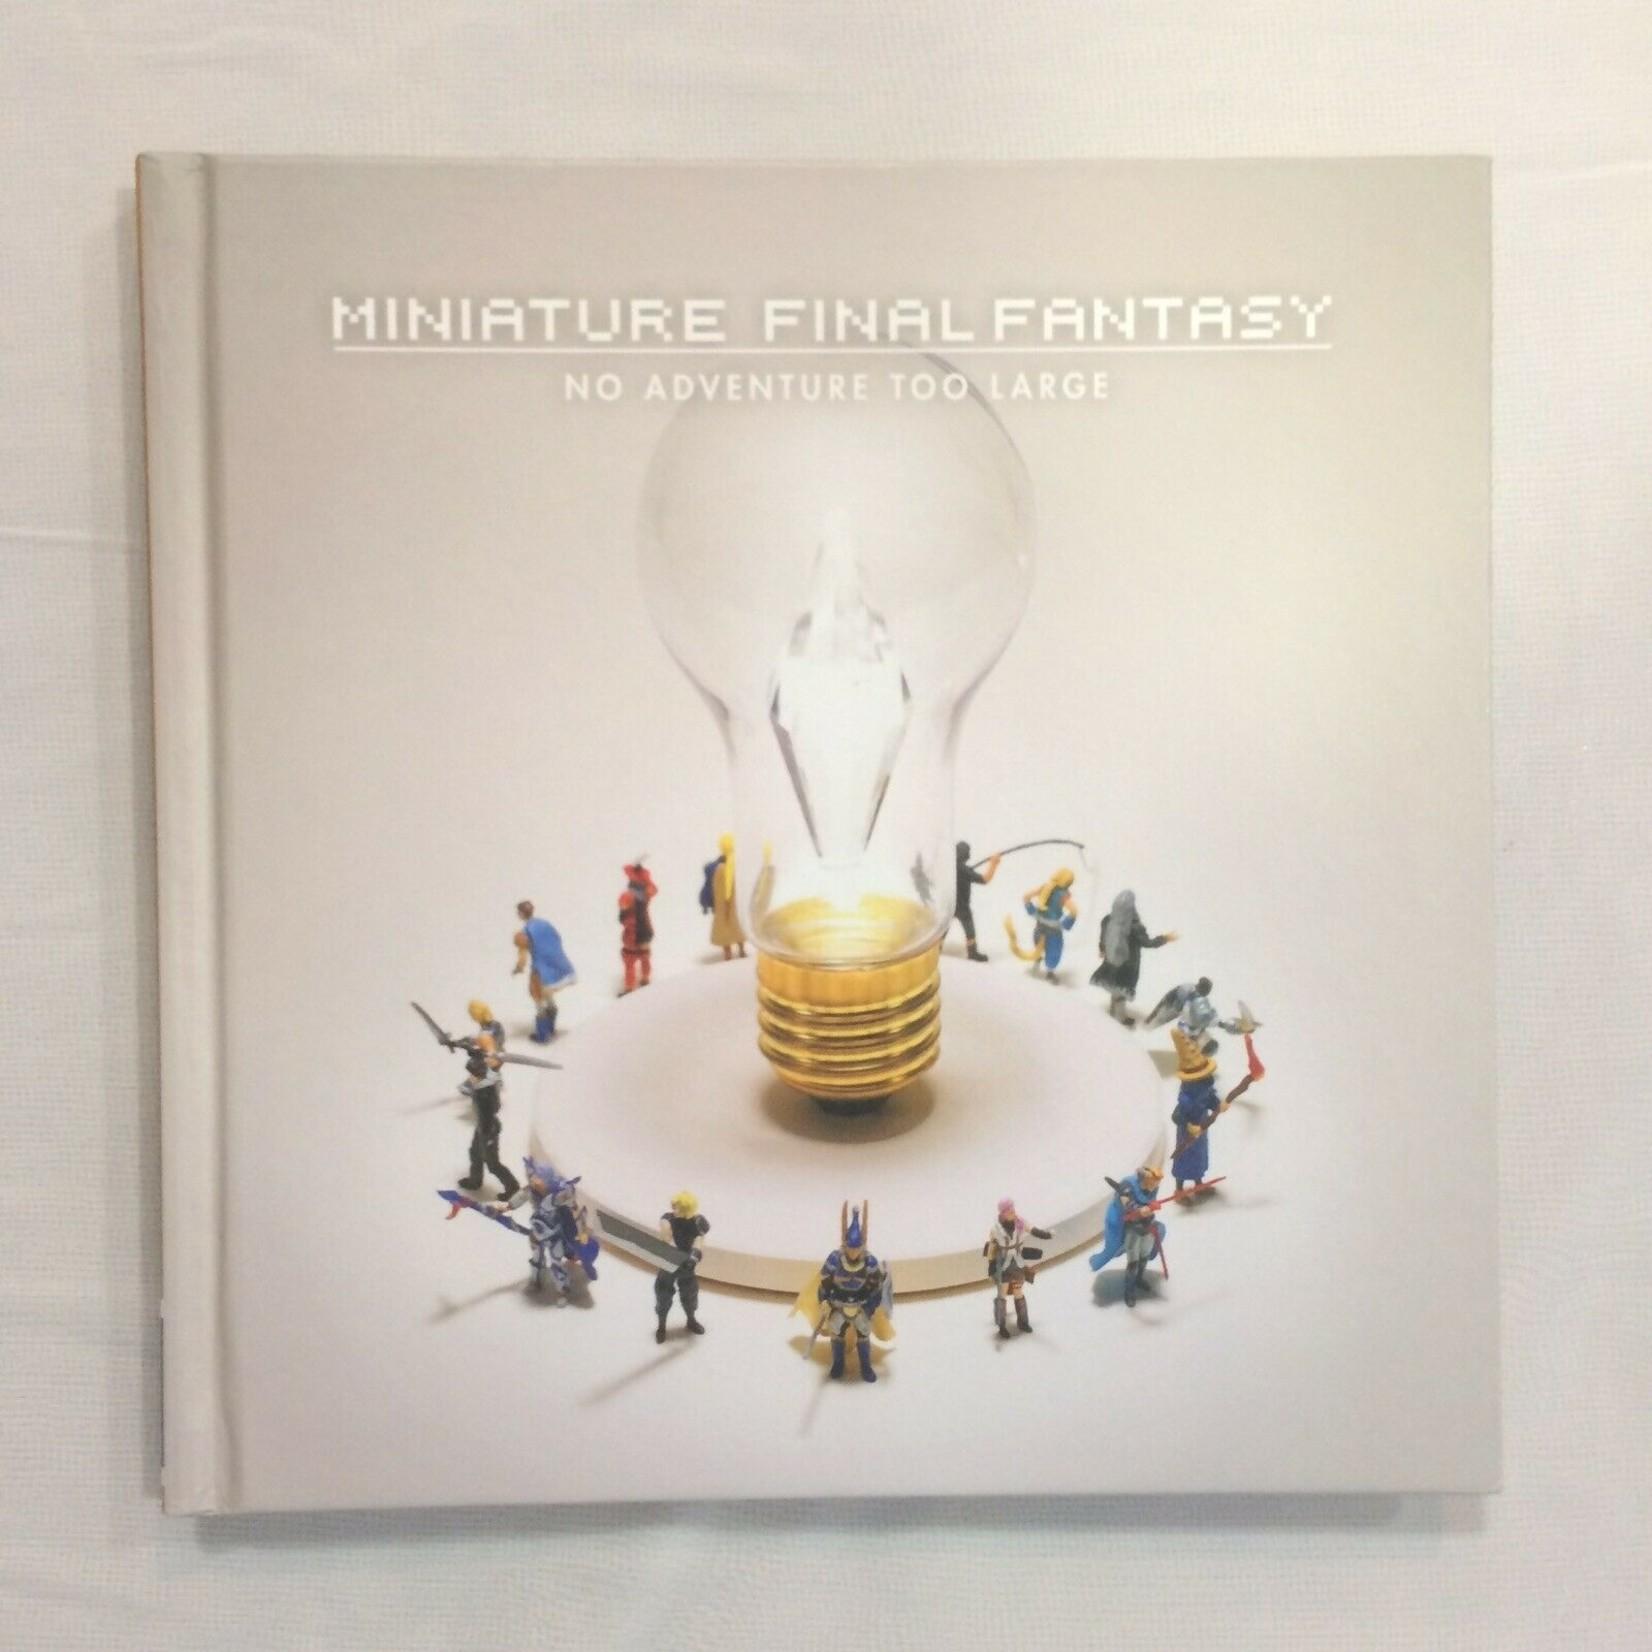 Miniature Final Fantasy no adventure to large